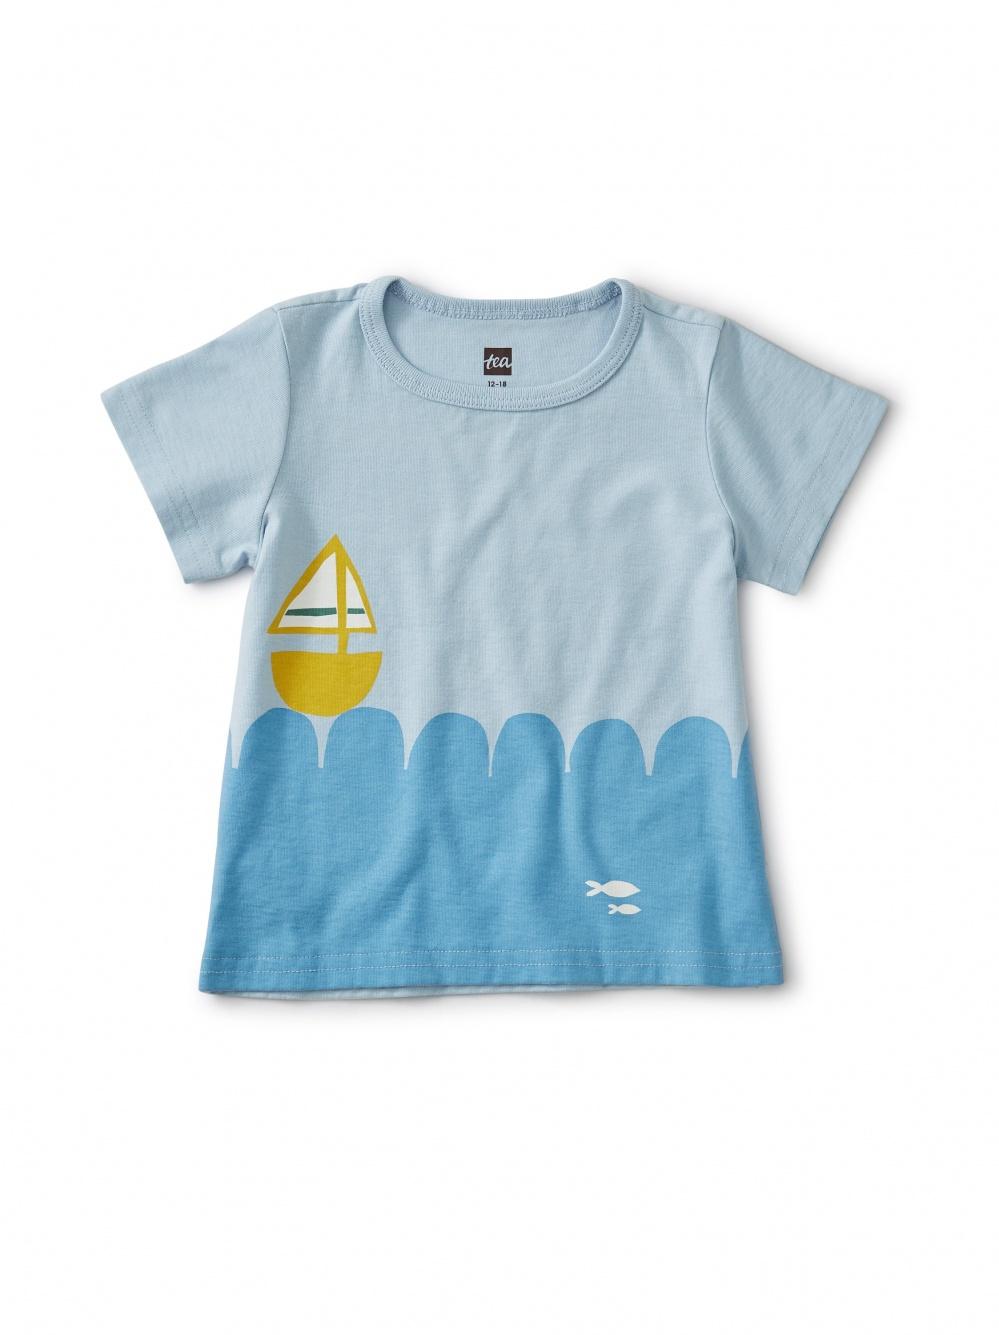 Set Sail Baby Tee